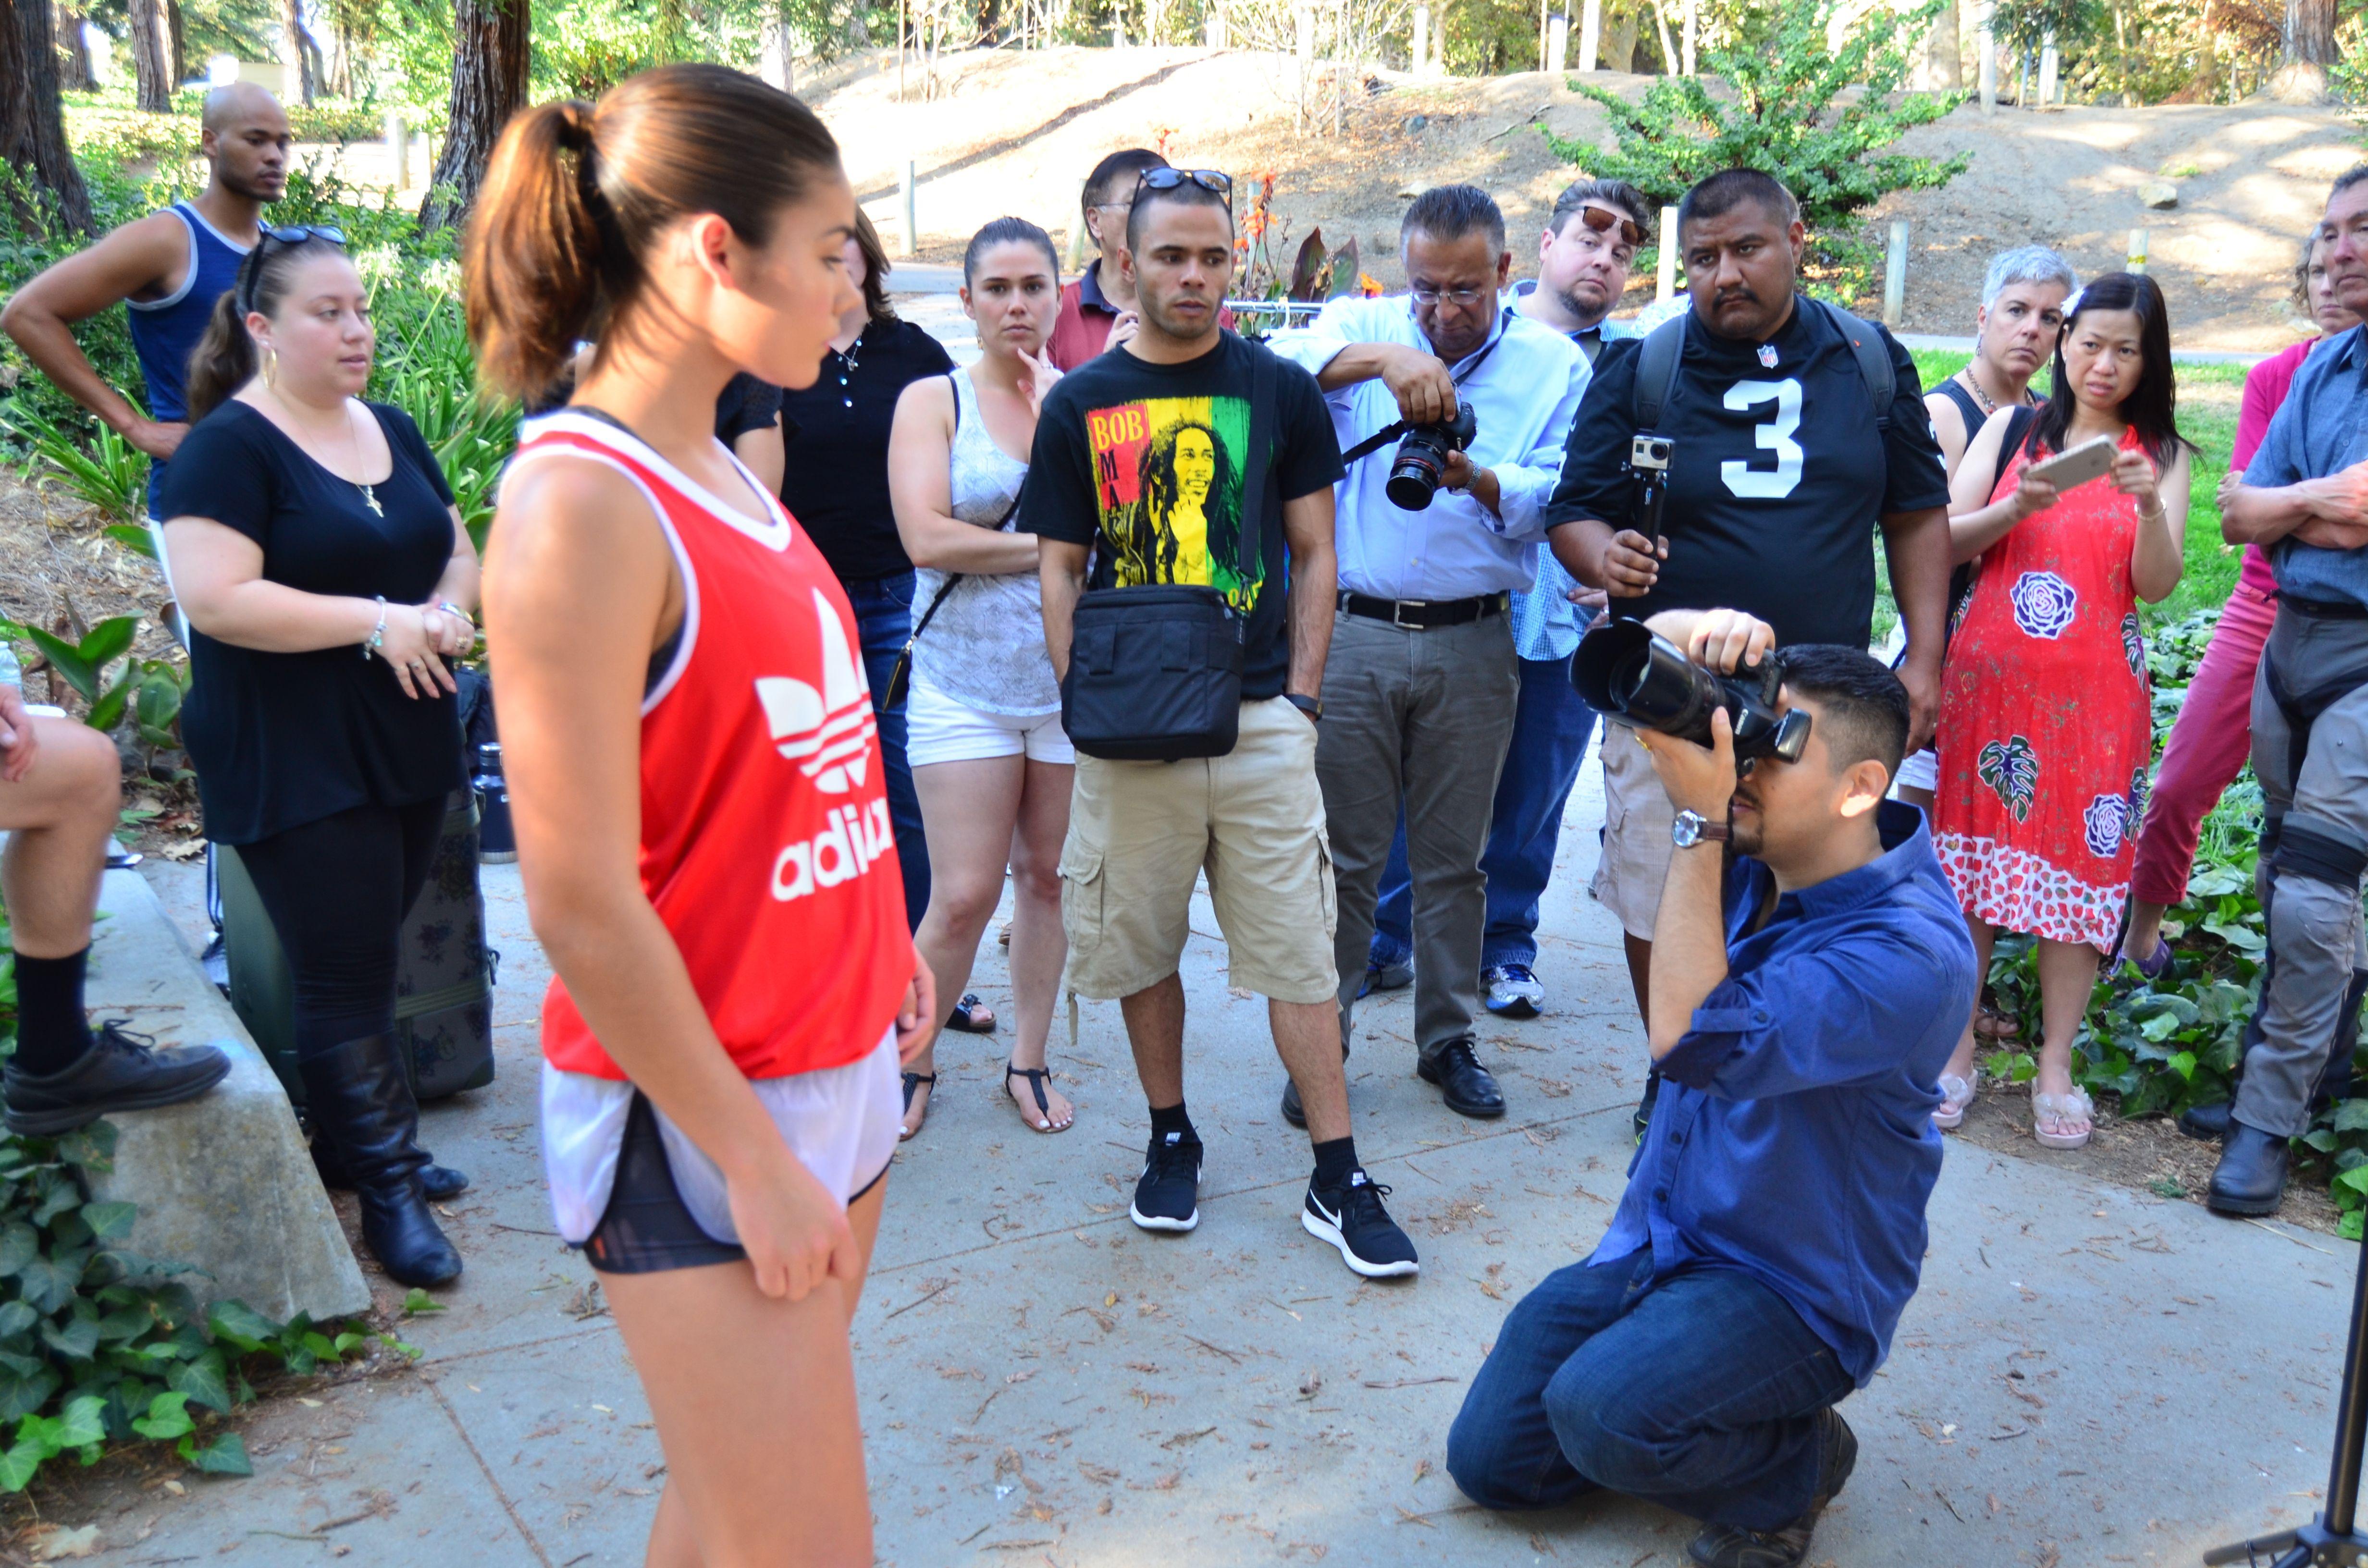 Professional Photographers of Santa Clara Valley